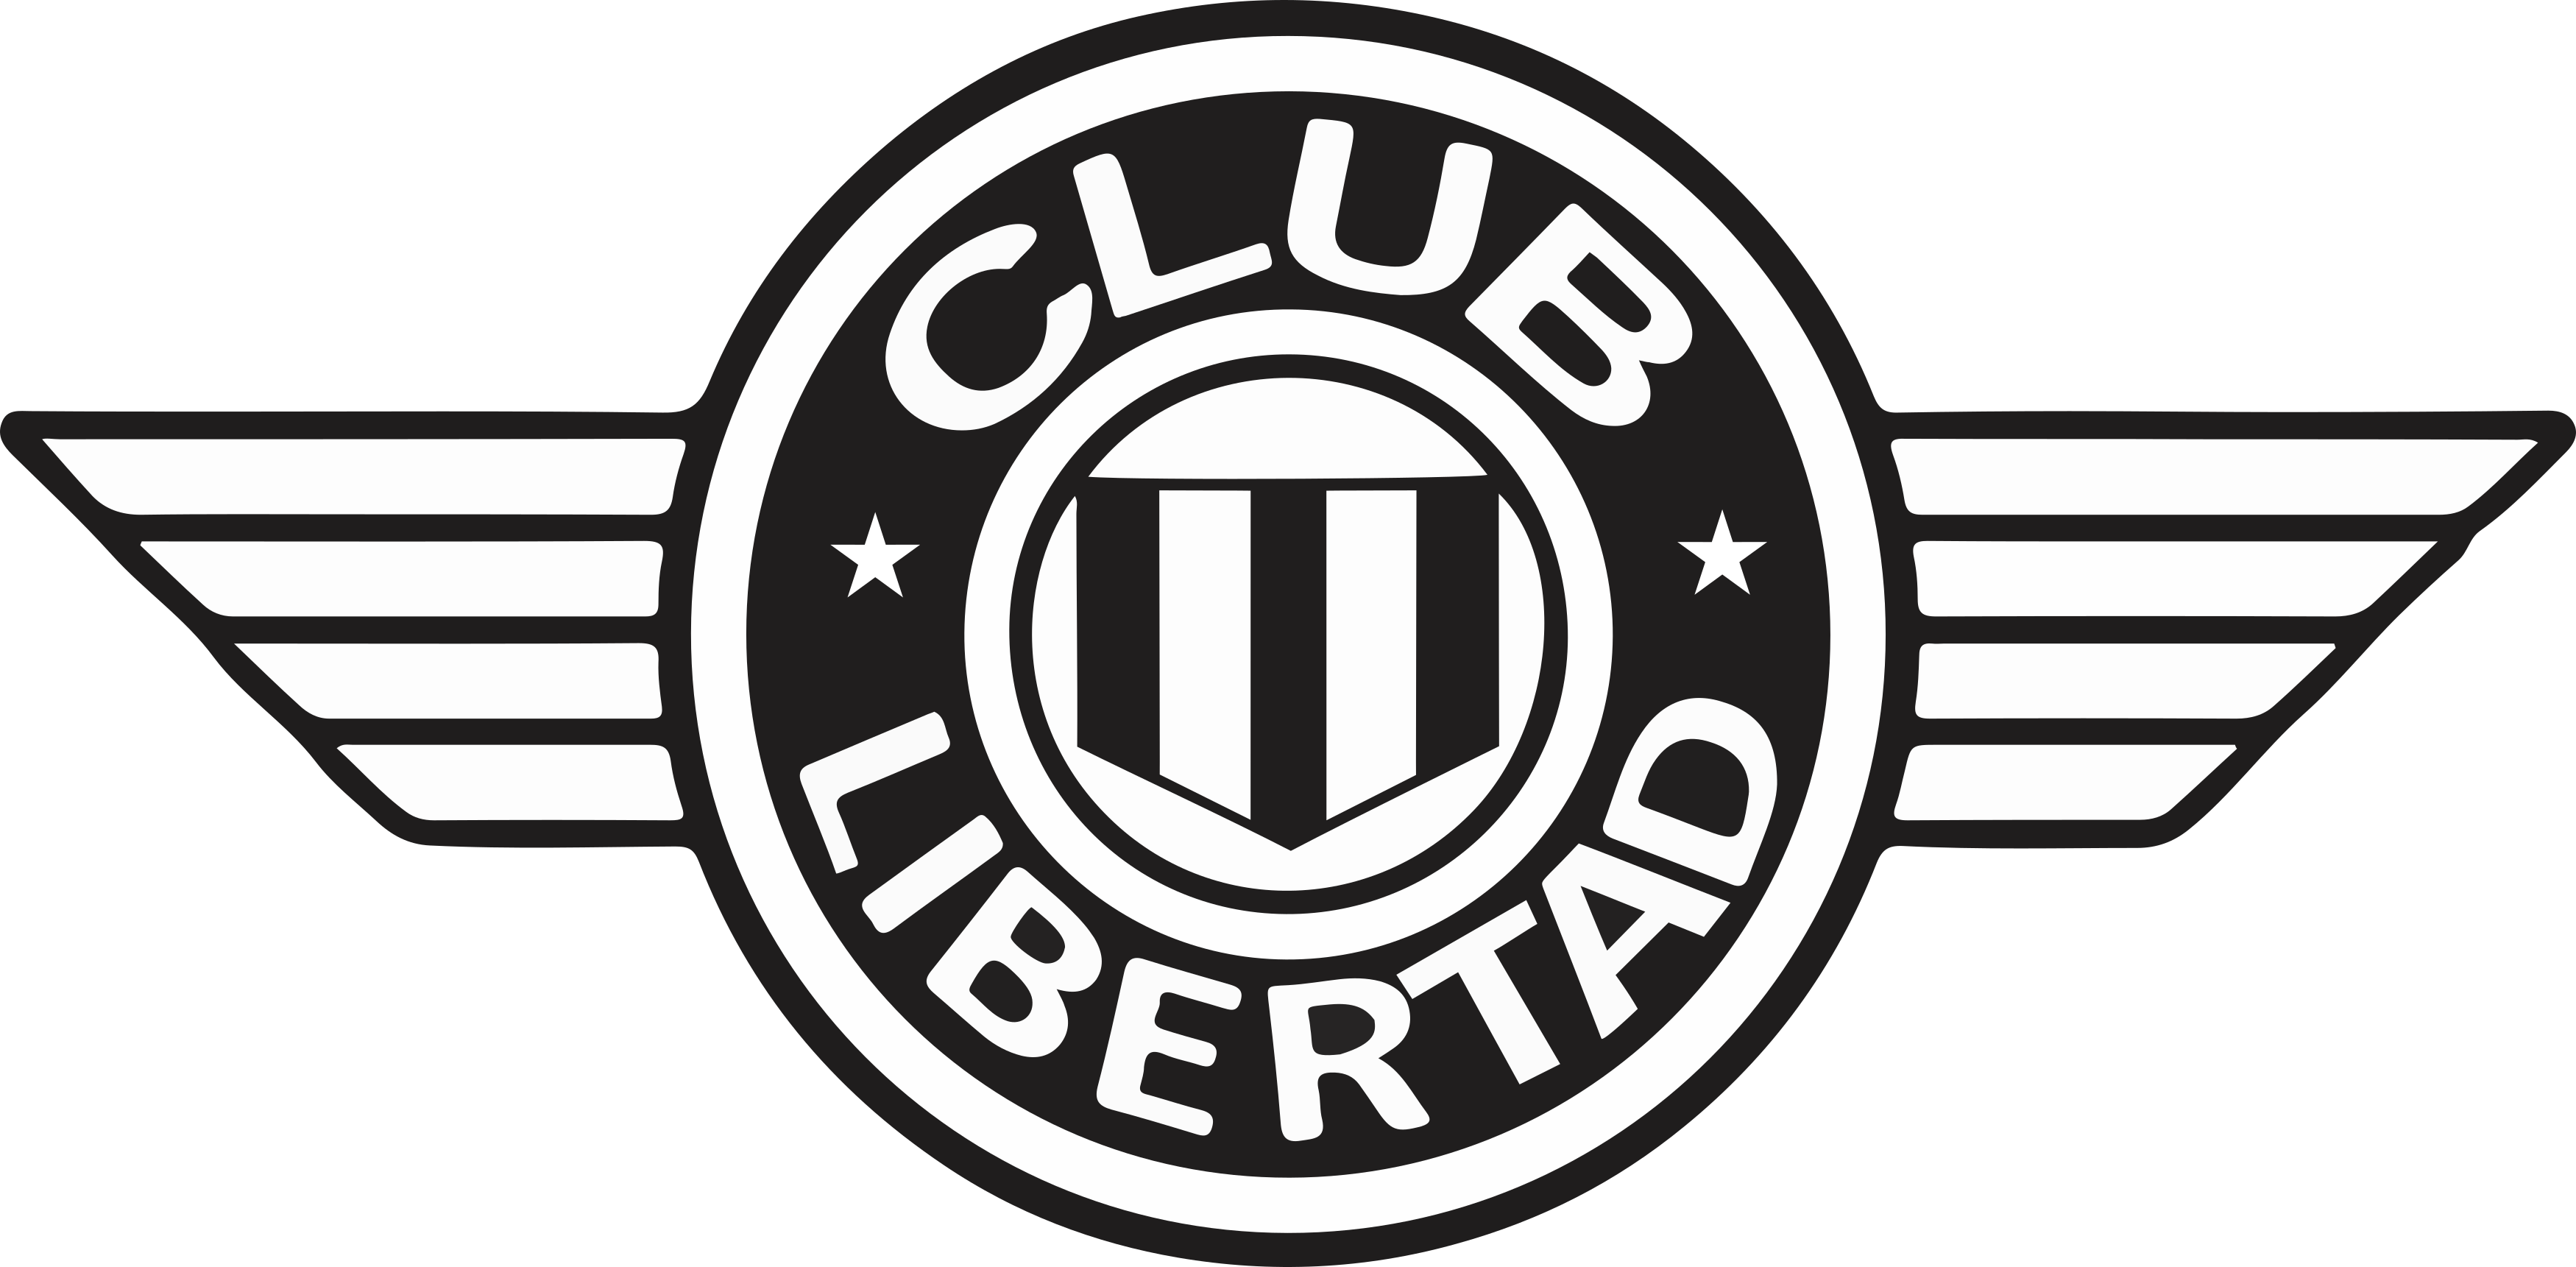 club libertad logo escudo - Club Libertad Logo